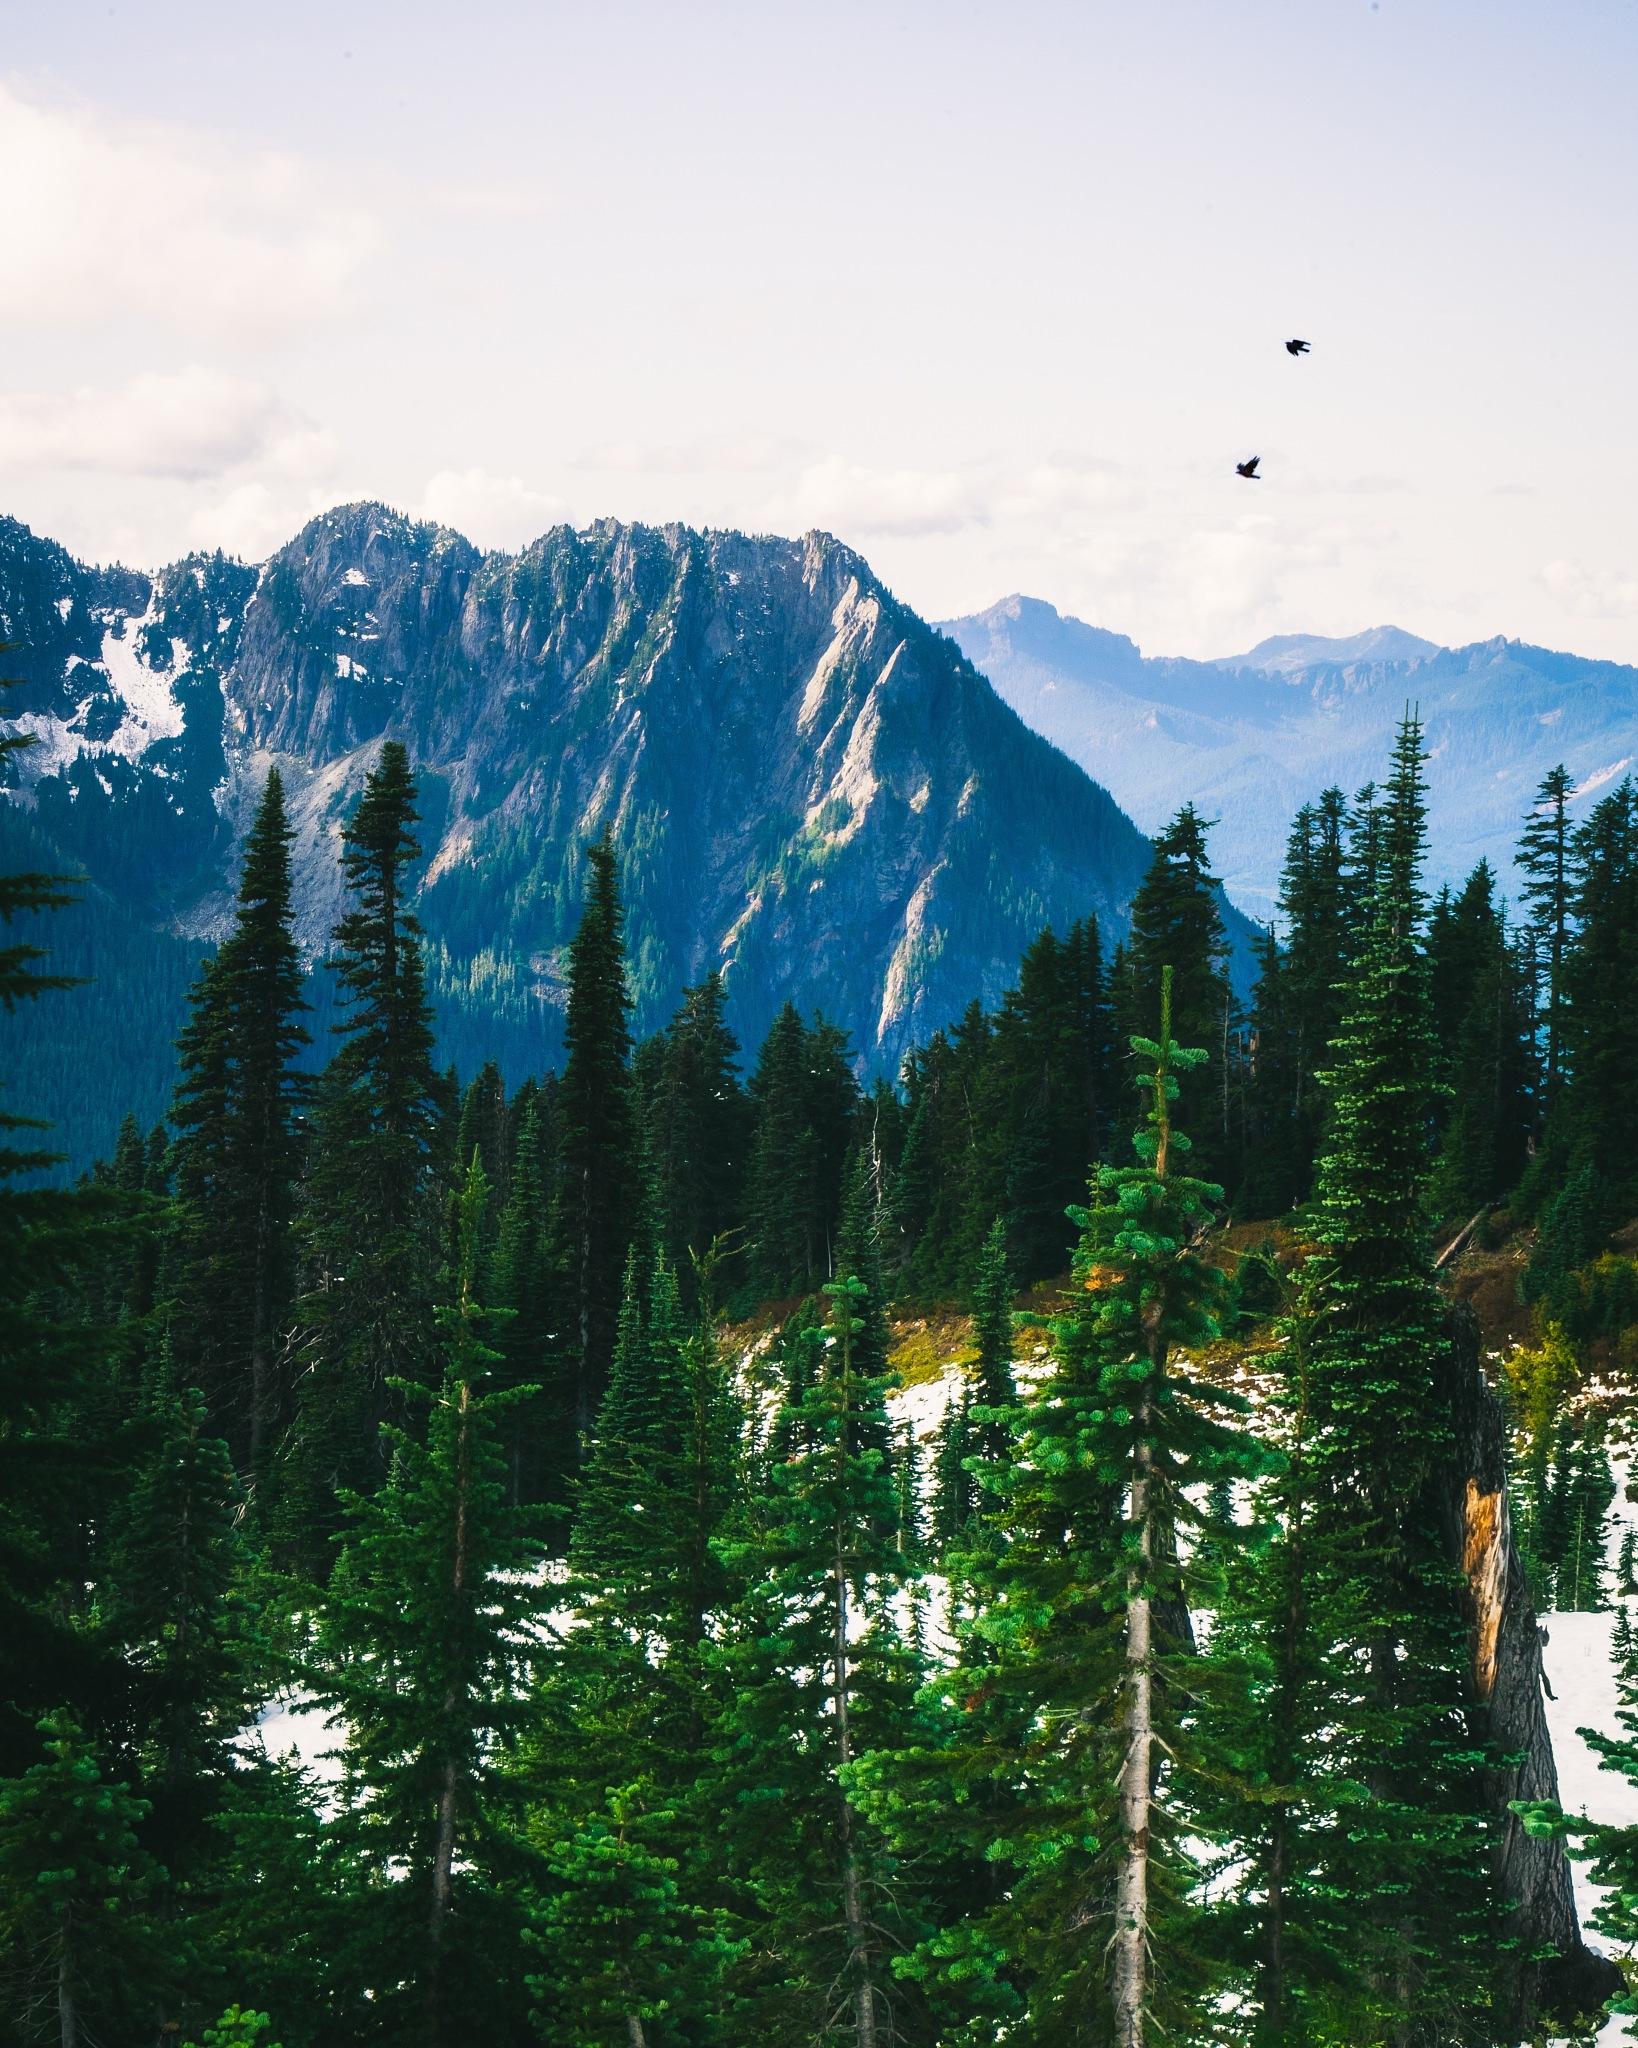 Keep Climbing by Yuzar Farid